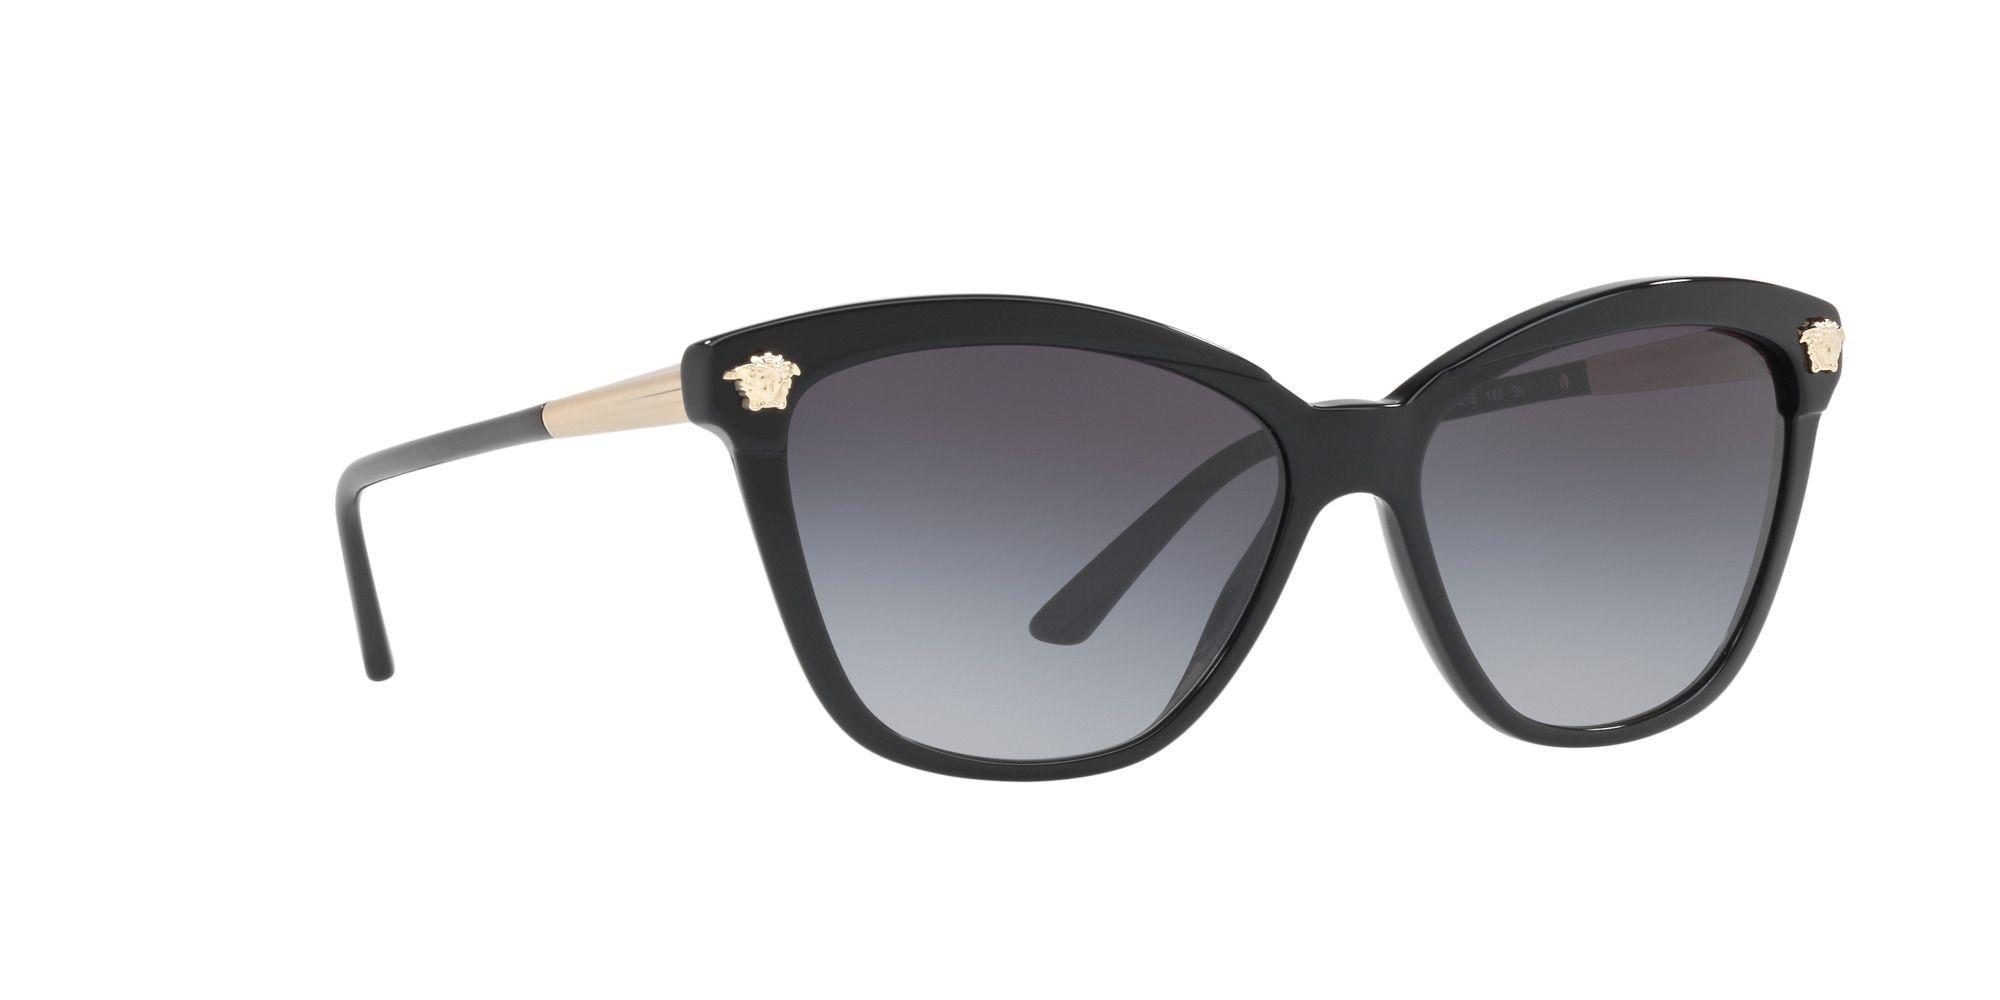 9180f726ec07 Versace - Black Ve4313 Butterfly Sunglasses - Lyst. View fullscreen